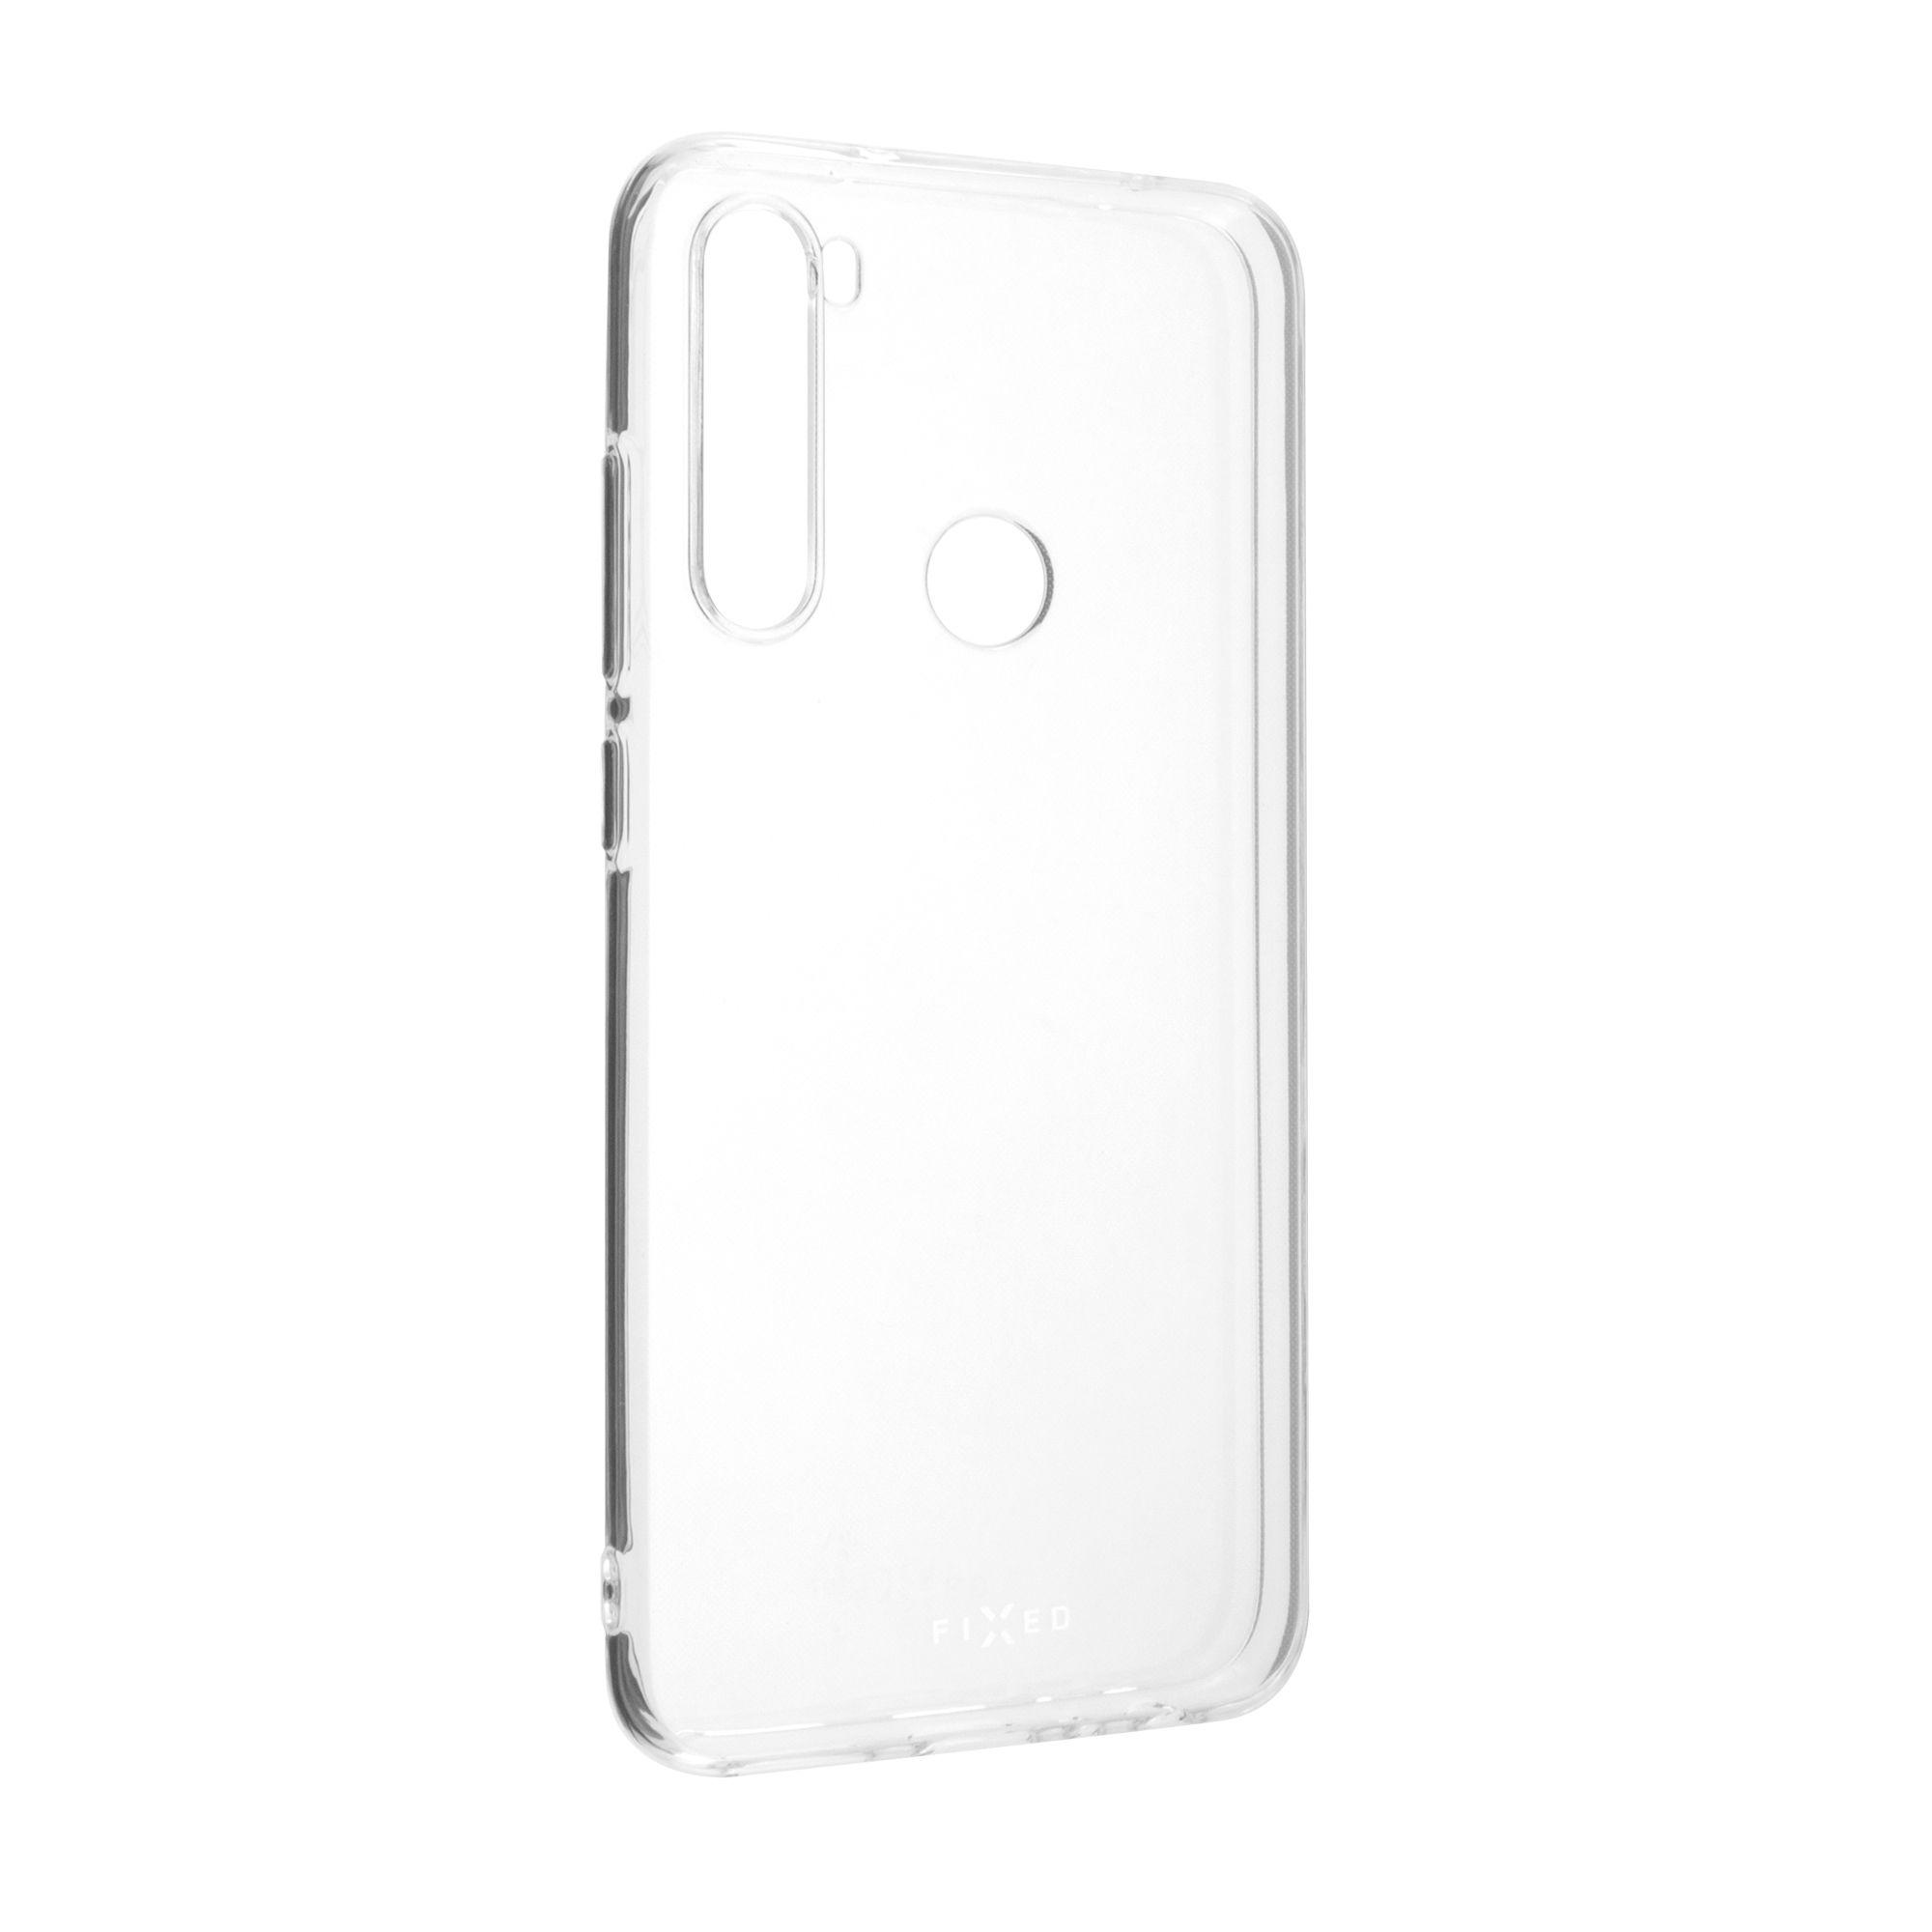 TPU gelové pouzdro FIXED pro Xiaomi Redmi Note 8, čiré